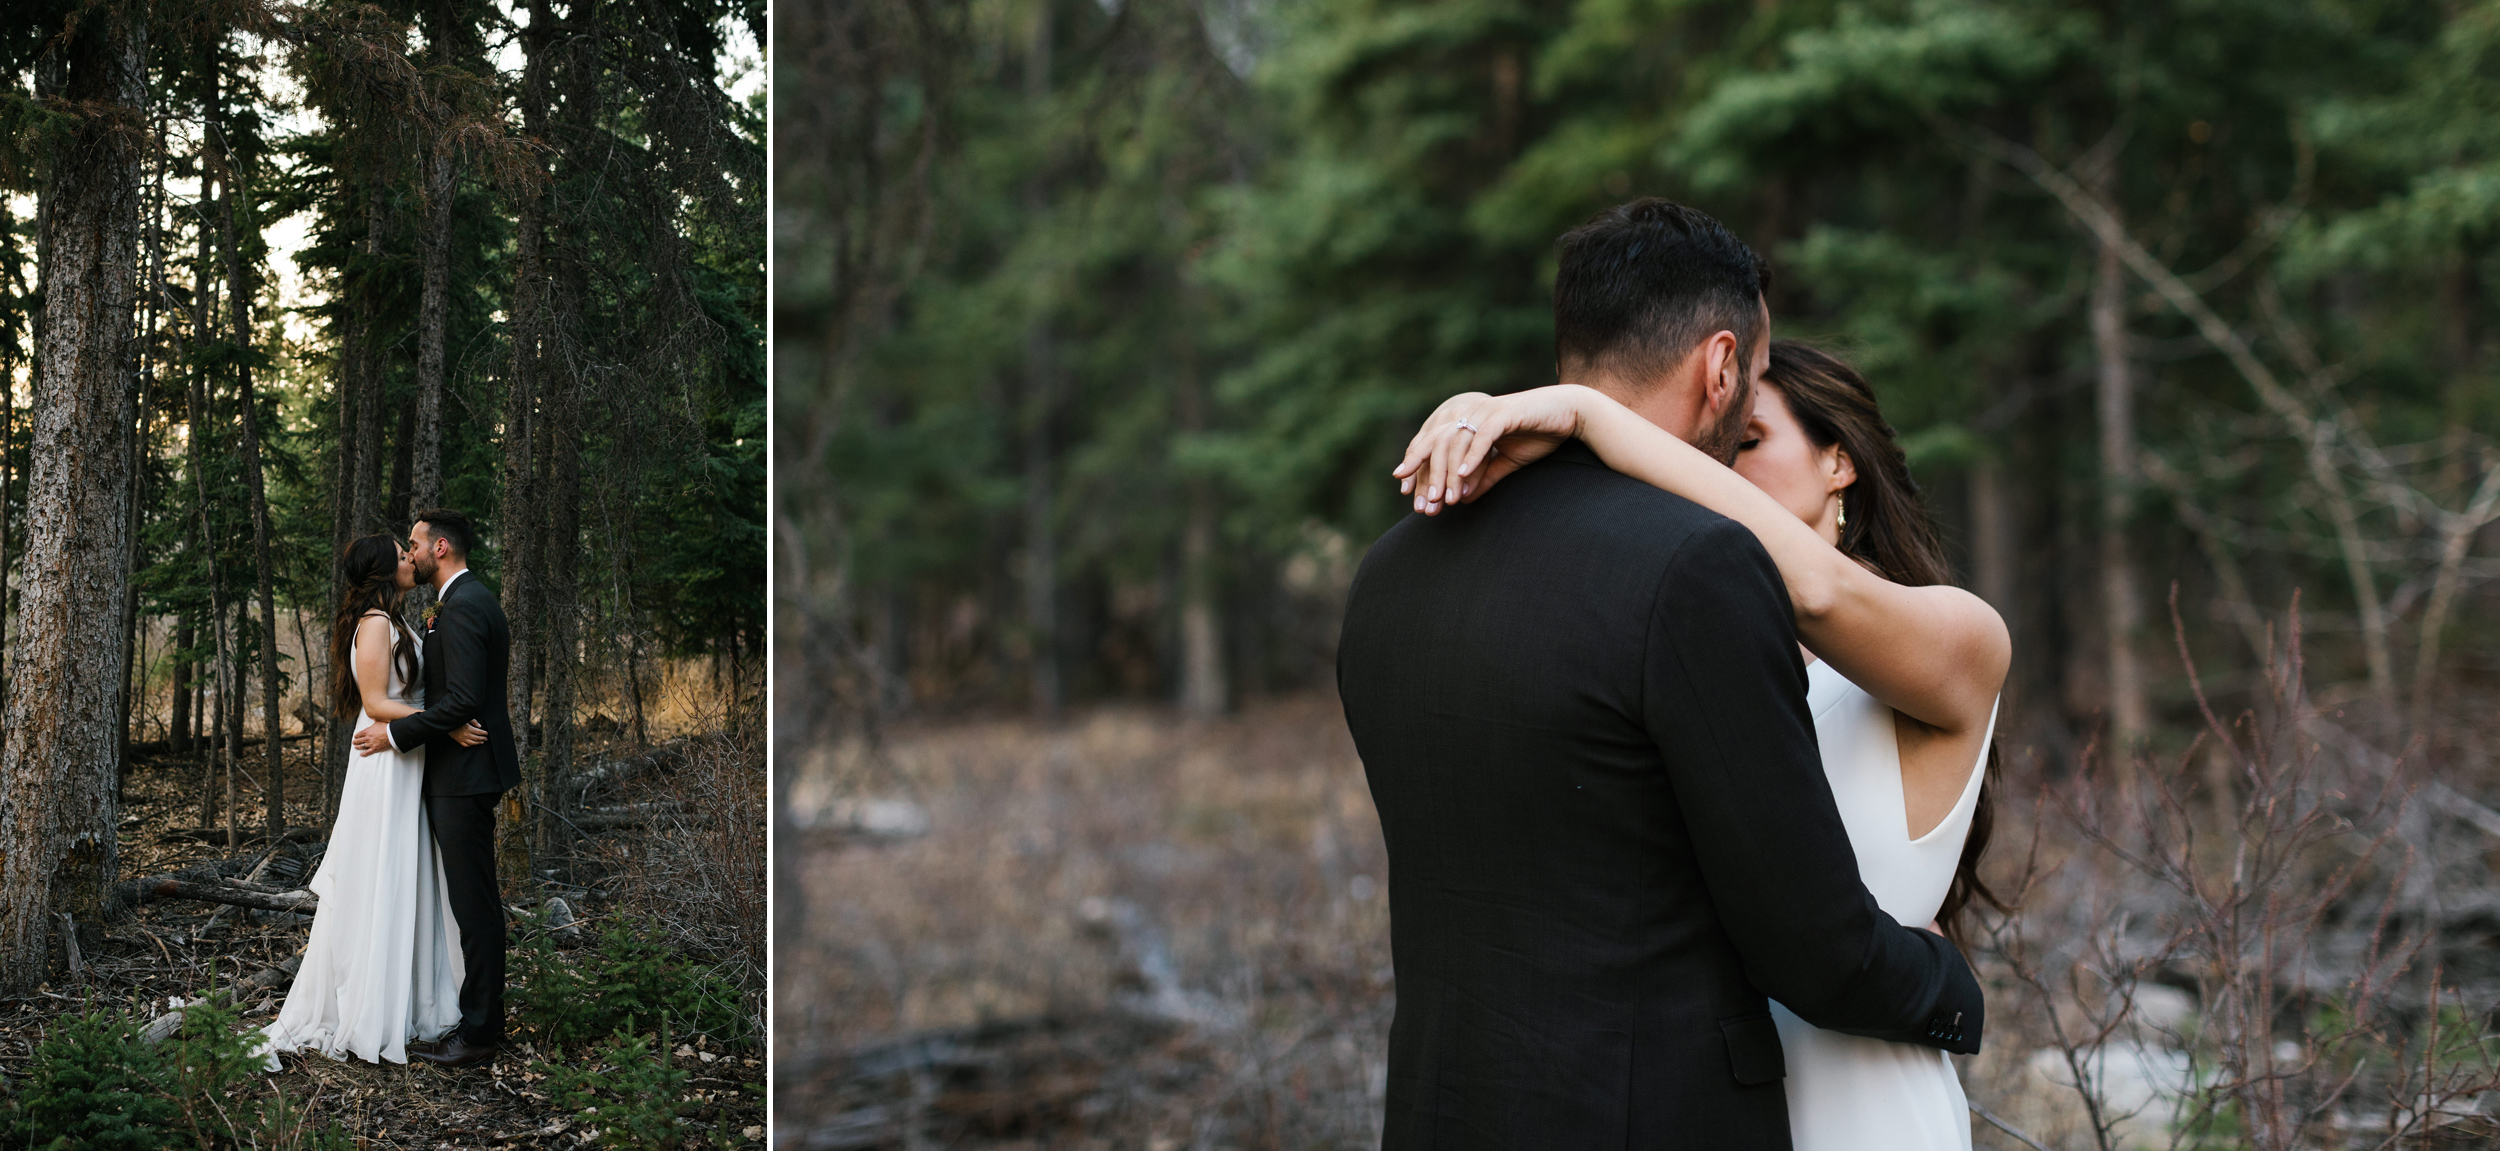 Canmore_Wedding_Photographers0034.jpg